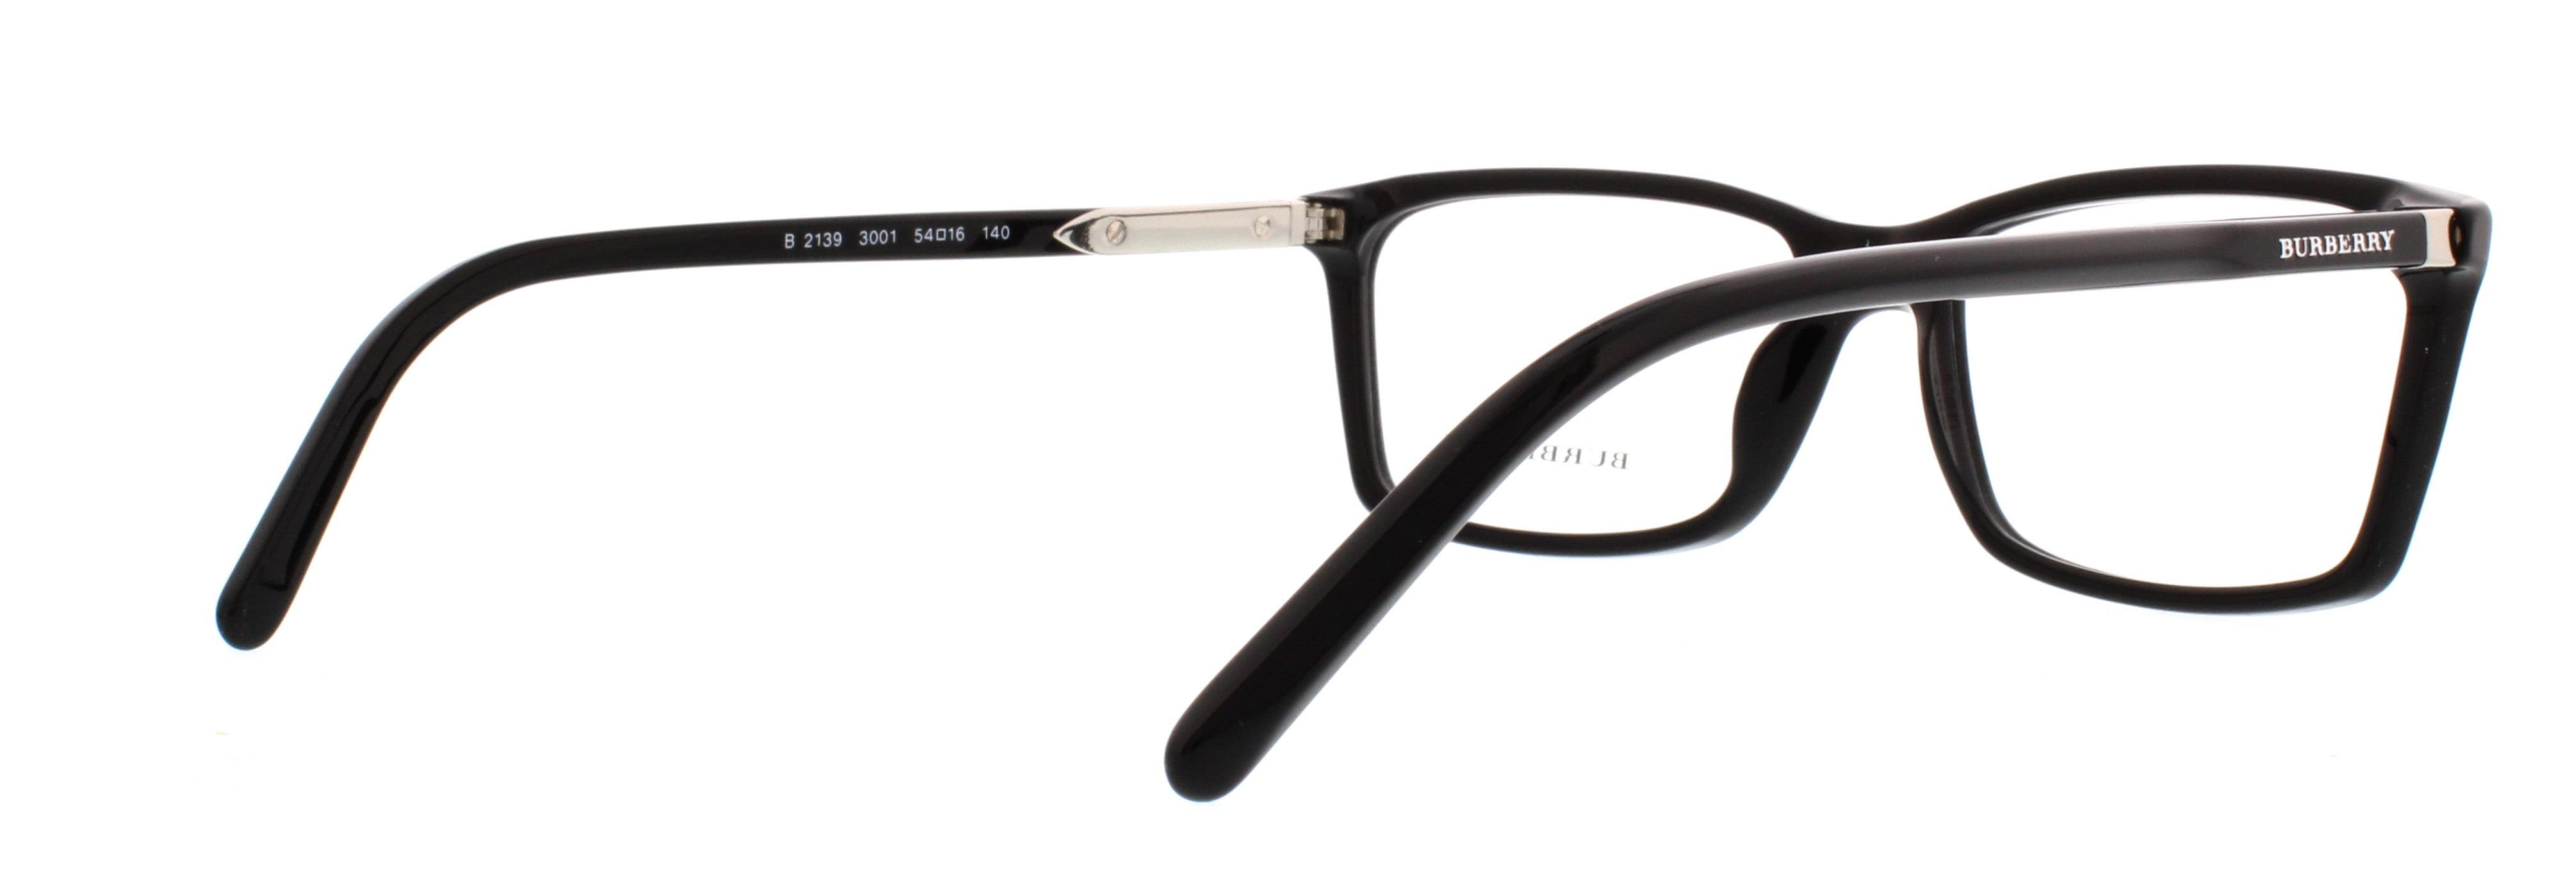 916d830d8b61 BURBERRY Eyeglasses BE 2139 3001 Black 54MM - Walmart.com